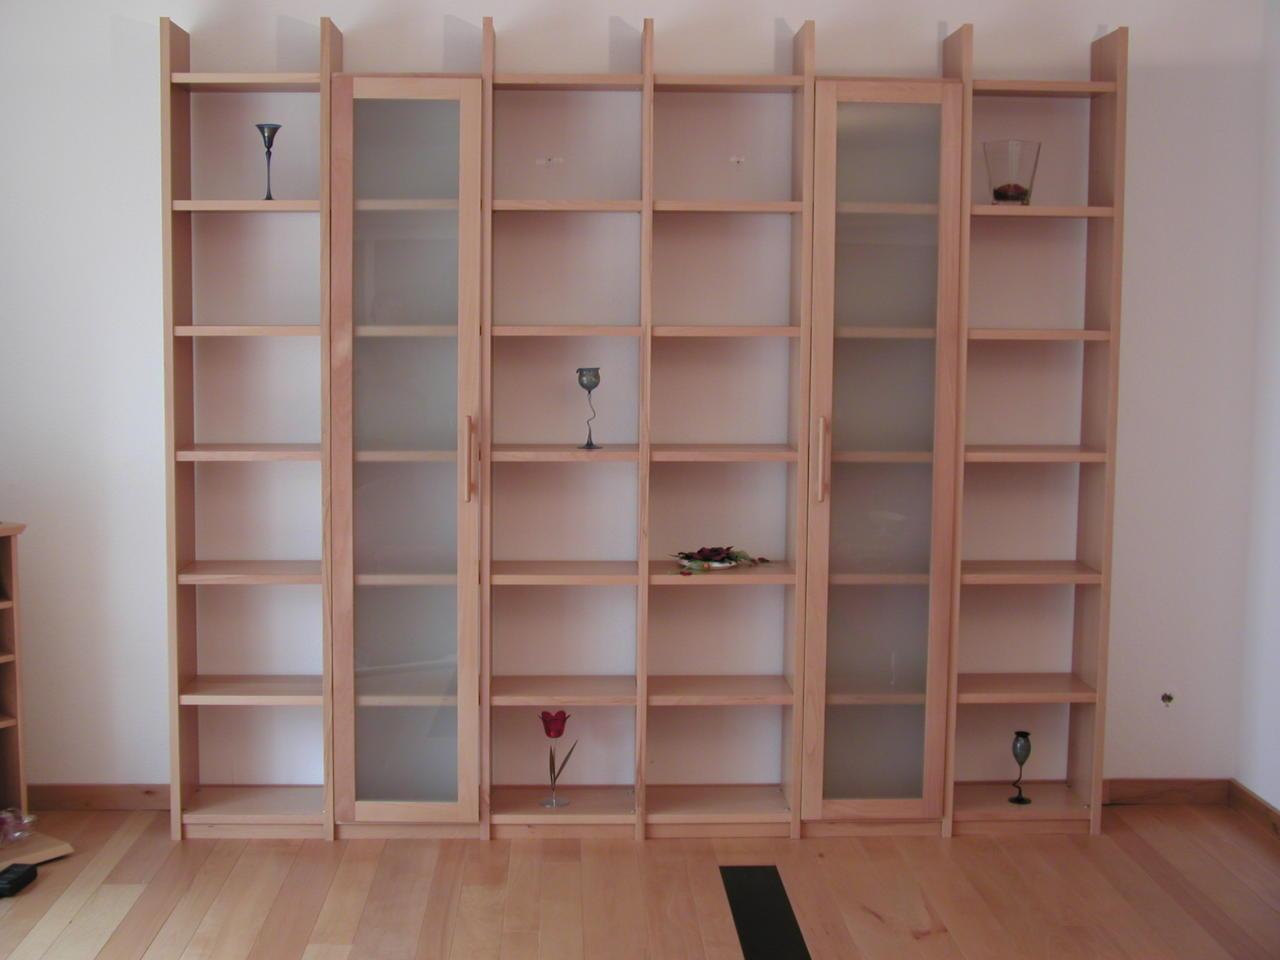 b cherregal wei lack regal b cherwand lackiert massivholz buche eiche ahorn ebay. Black Bedroom Furniture Sets. Home Design Ideas